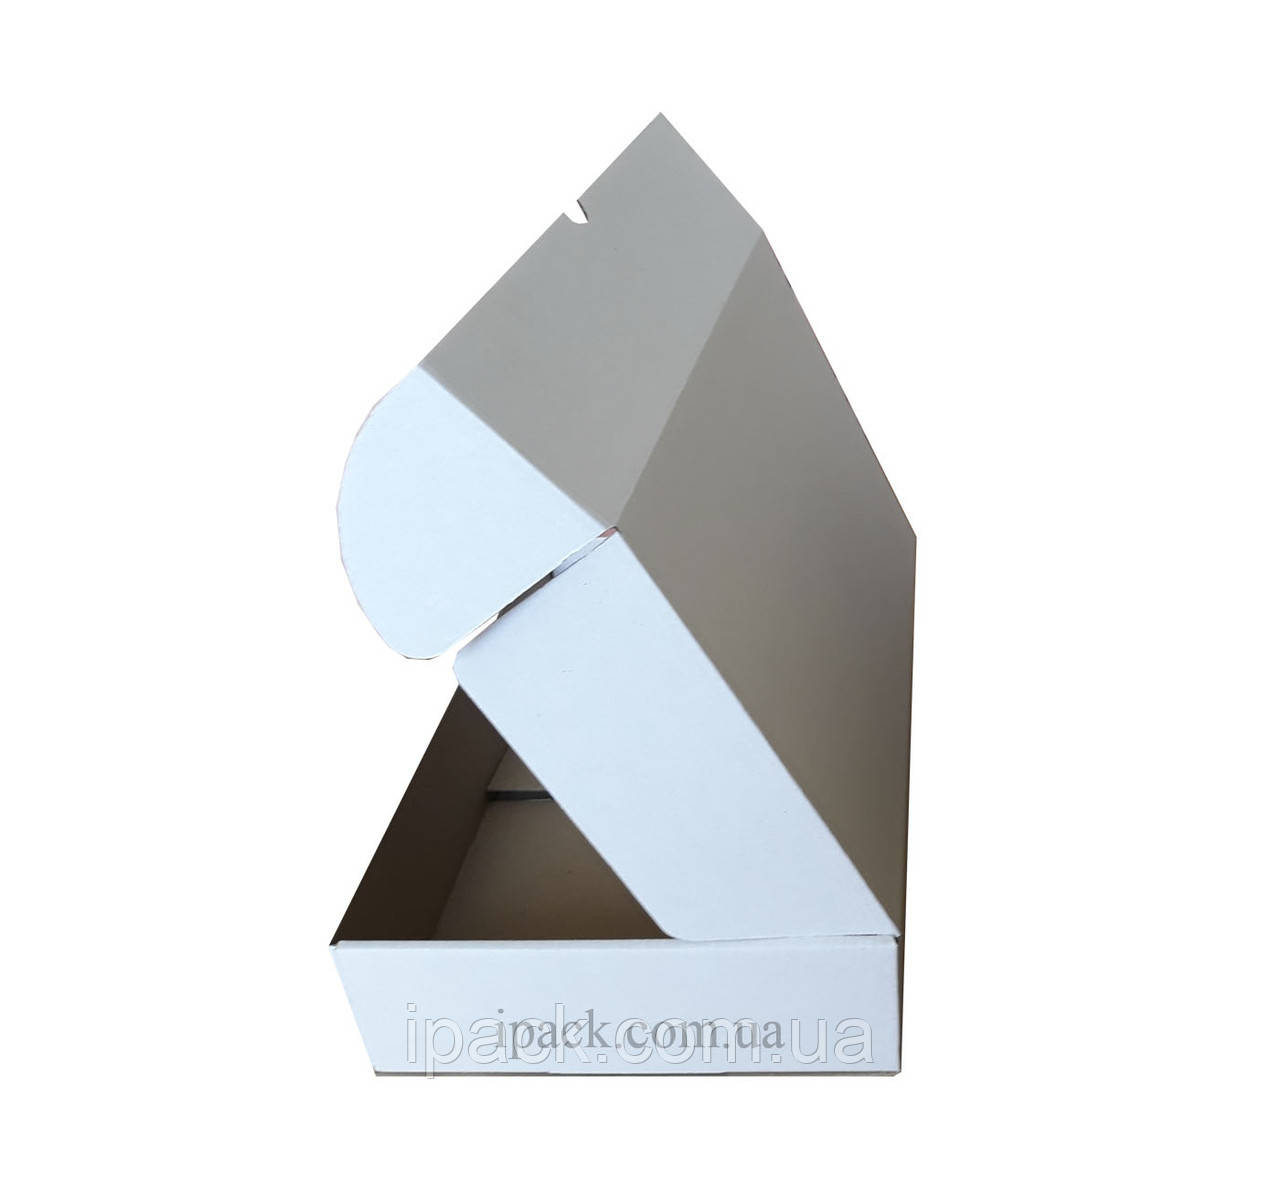 Коробка картонная самосборная, 470*450*33, мм, белая, микрогофрокартон